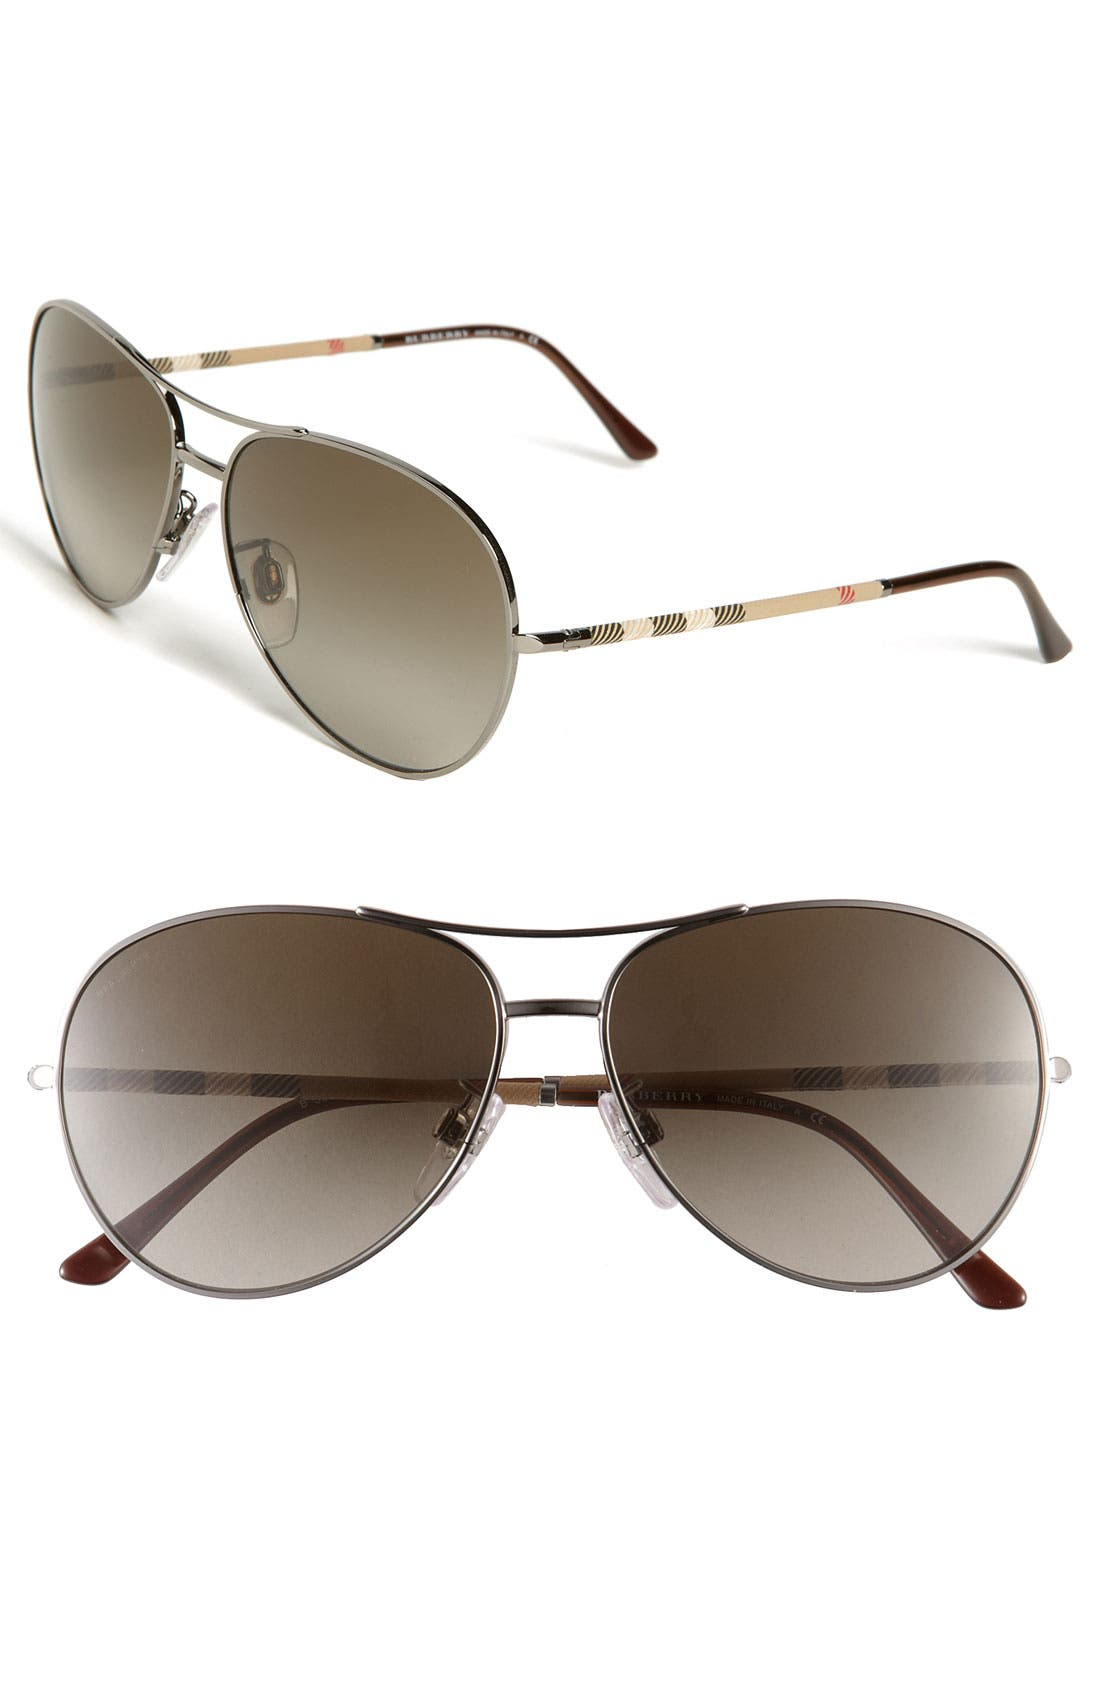 Alternate Image 1 Selected - Burberry Metal Aviator Sunglasses